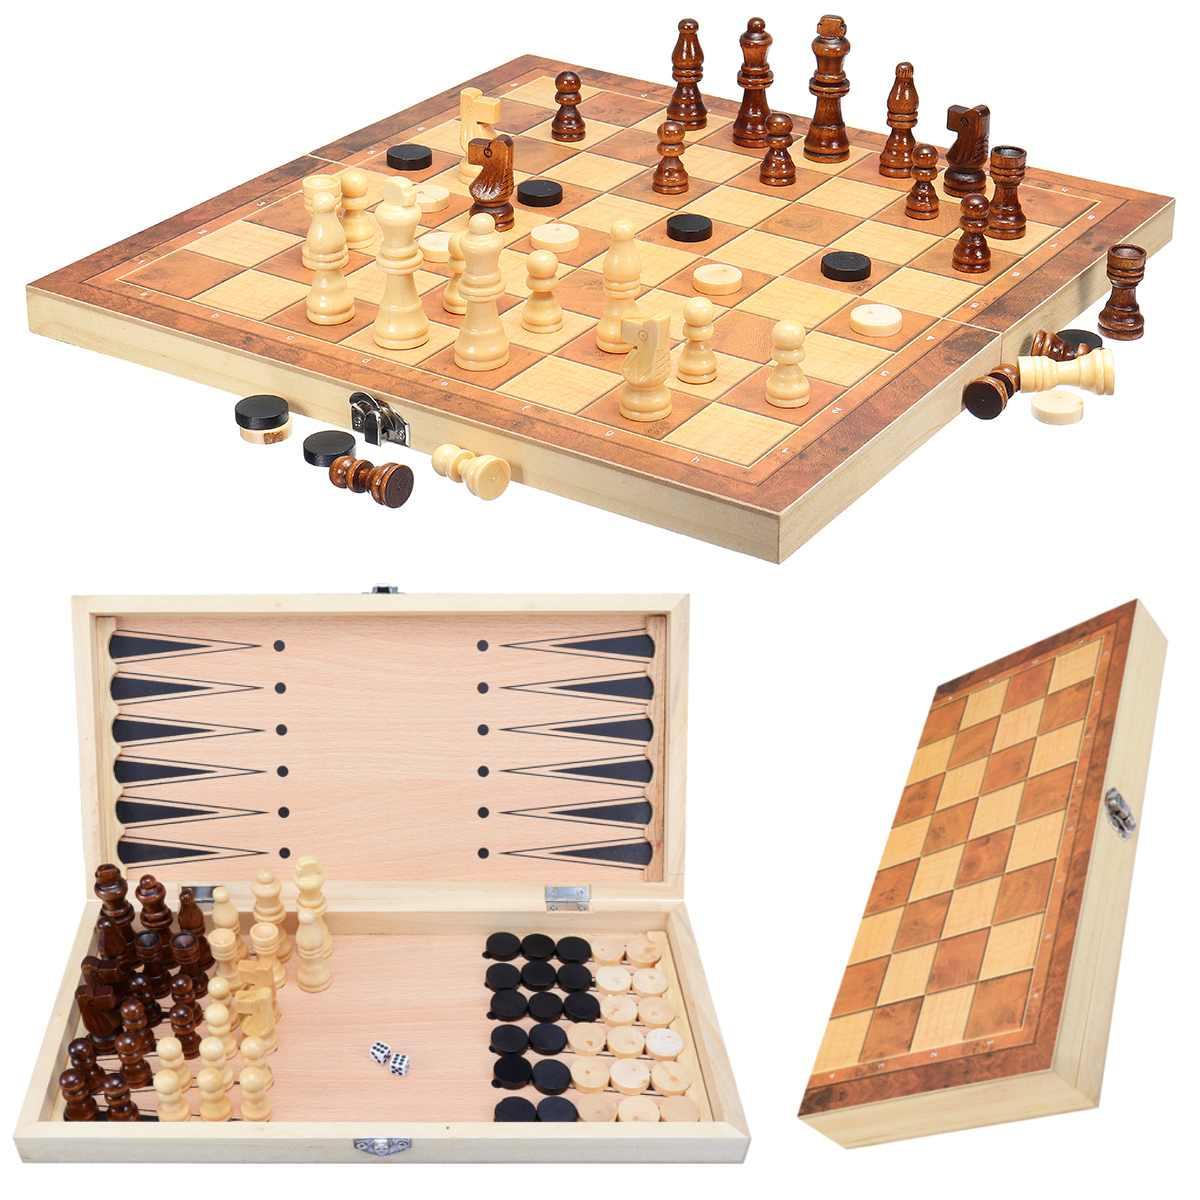 34 X 34cm Folding Chessboard Wooden Chess Board Box Educational Magnetic Chessmen Set Portable Entertainment Desktop Chess Game